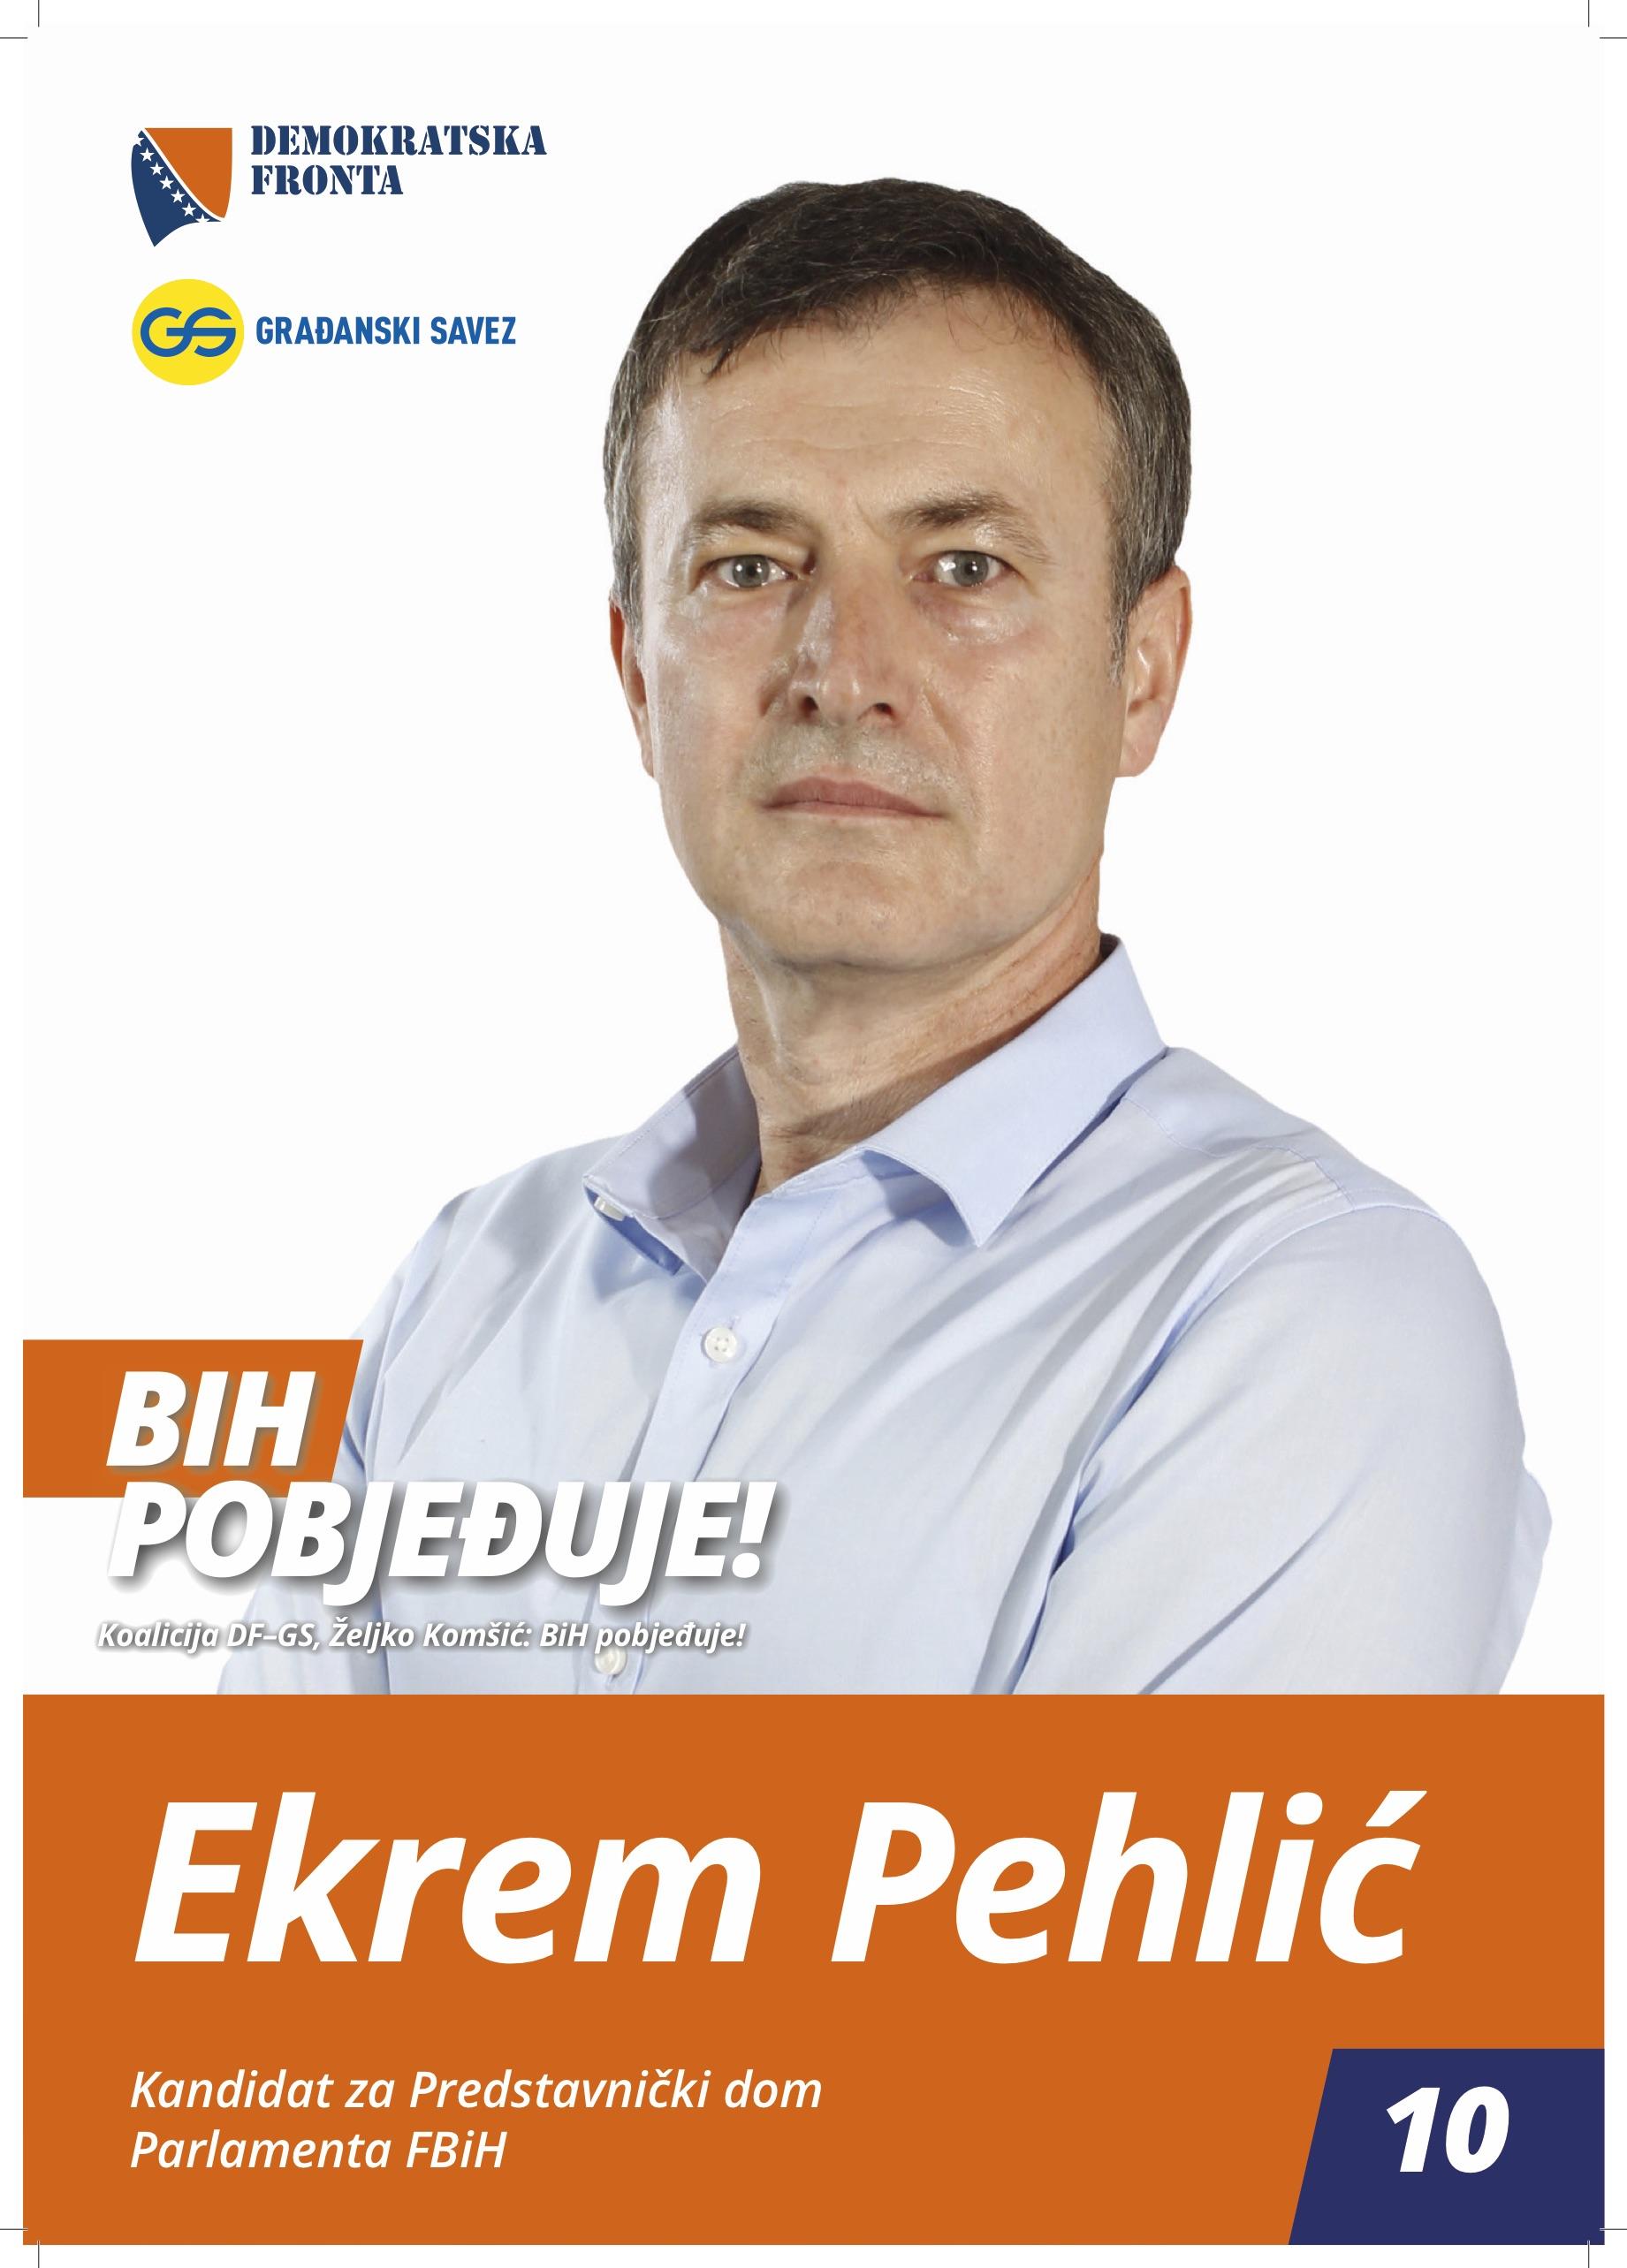 Ekrem Pehlić, profesor doktor nauka